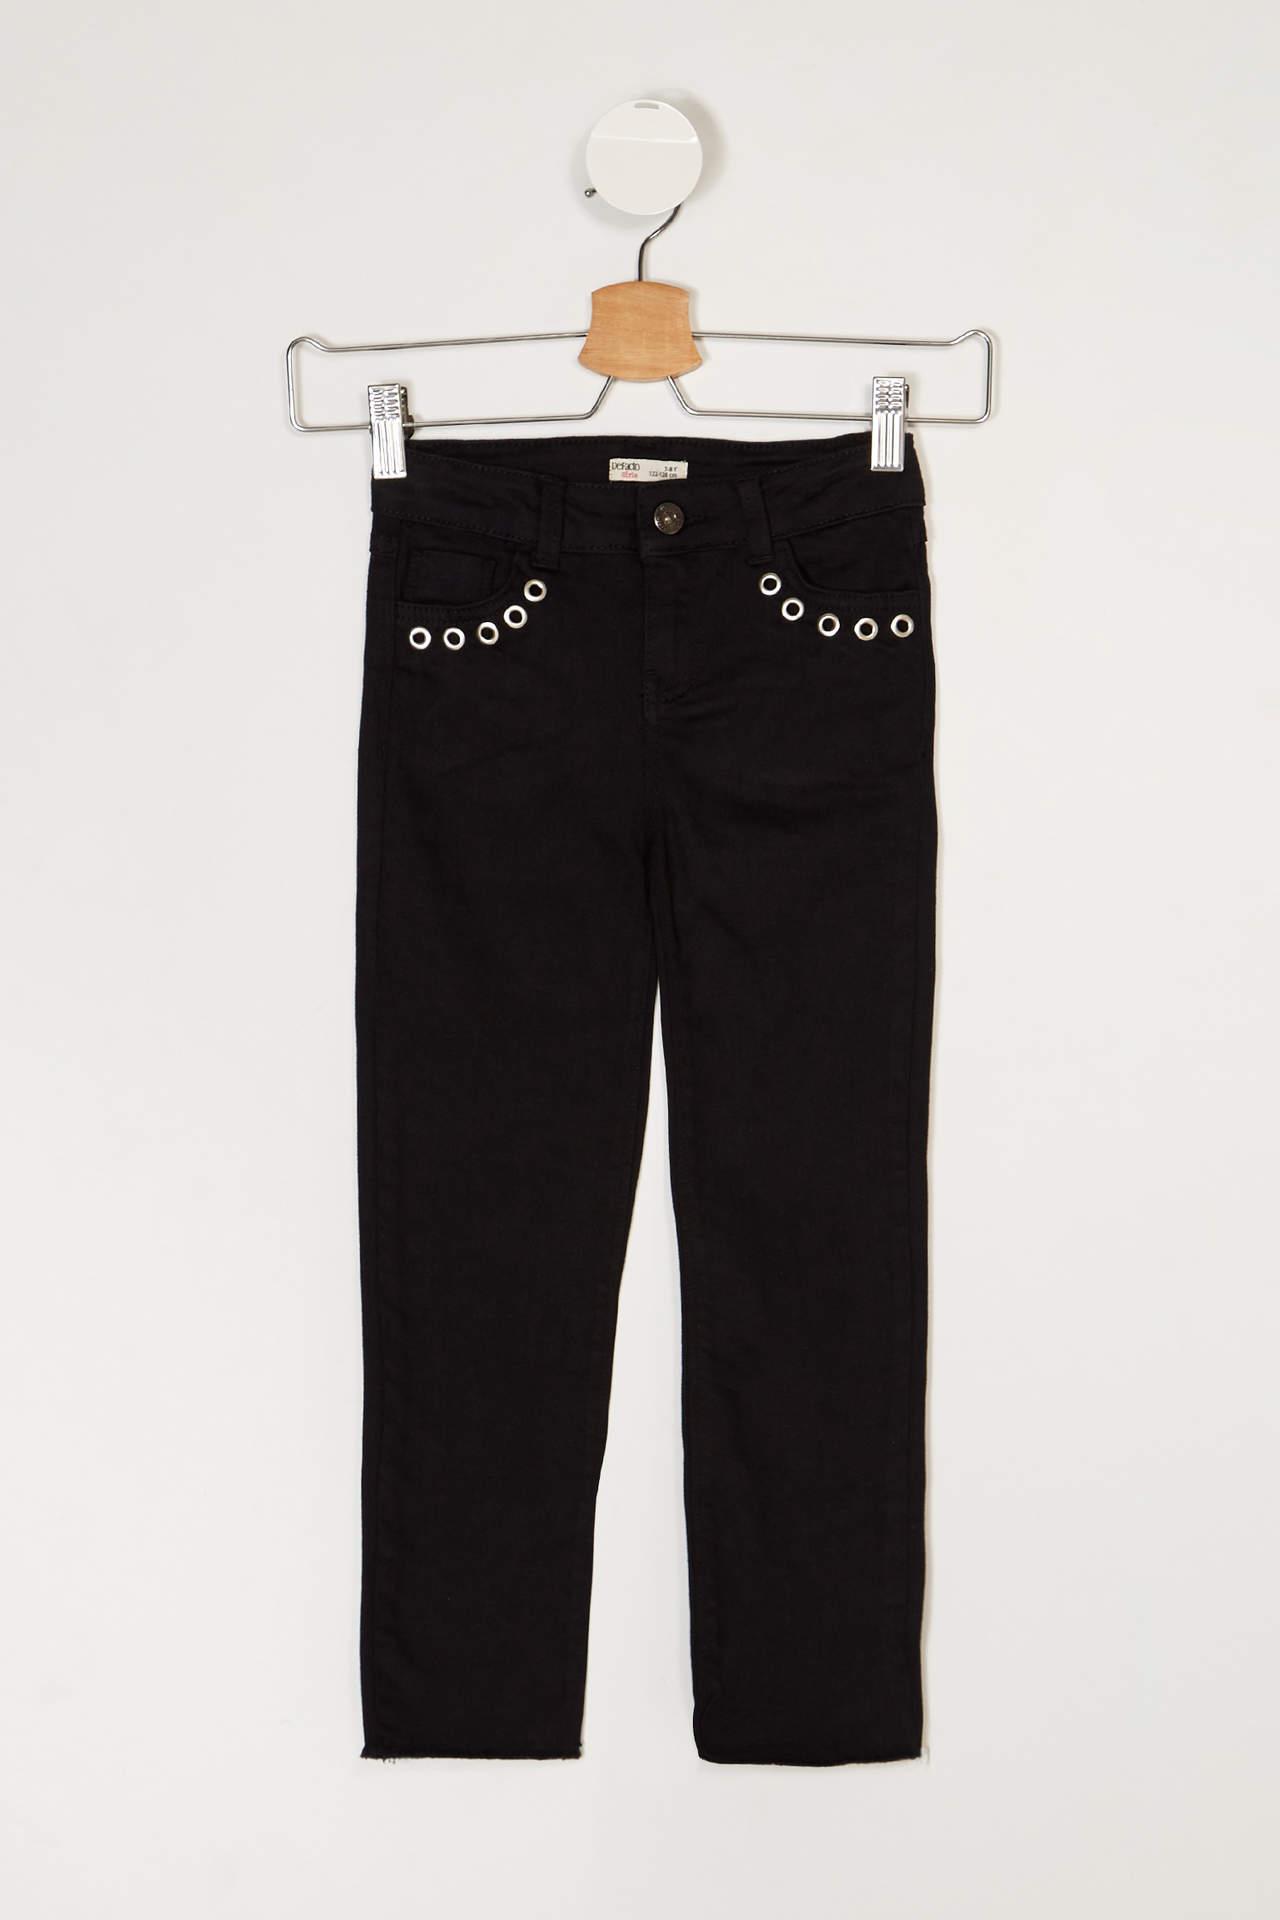 DeFacto Kız Çocuk Skinny Fit Jean Pantolon Siyah female